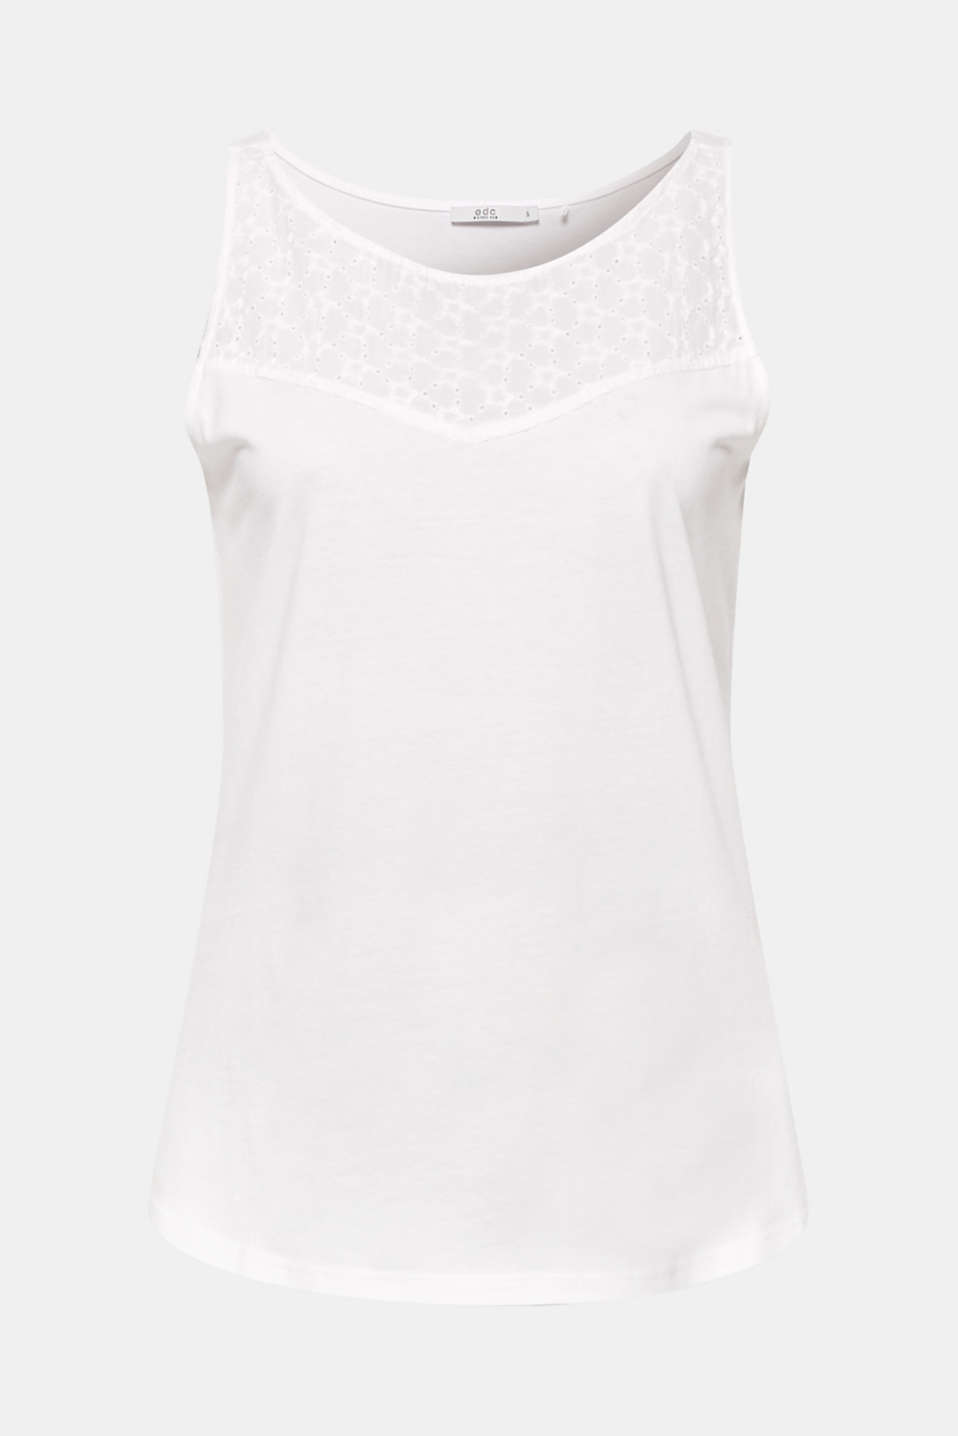 T-Shirts, WHITE, detail image number 6